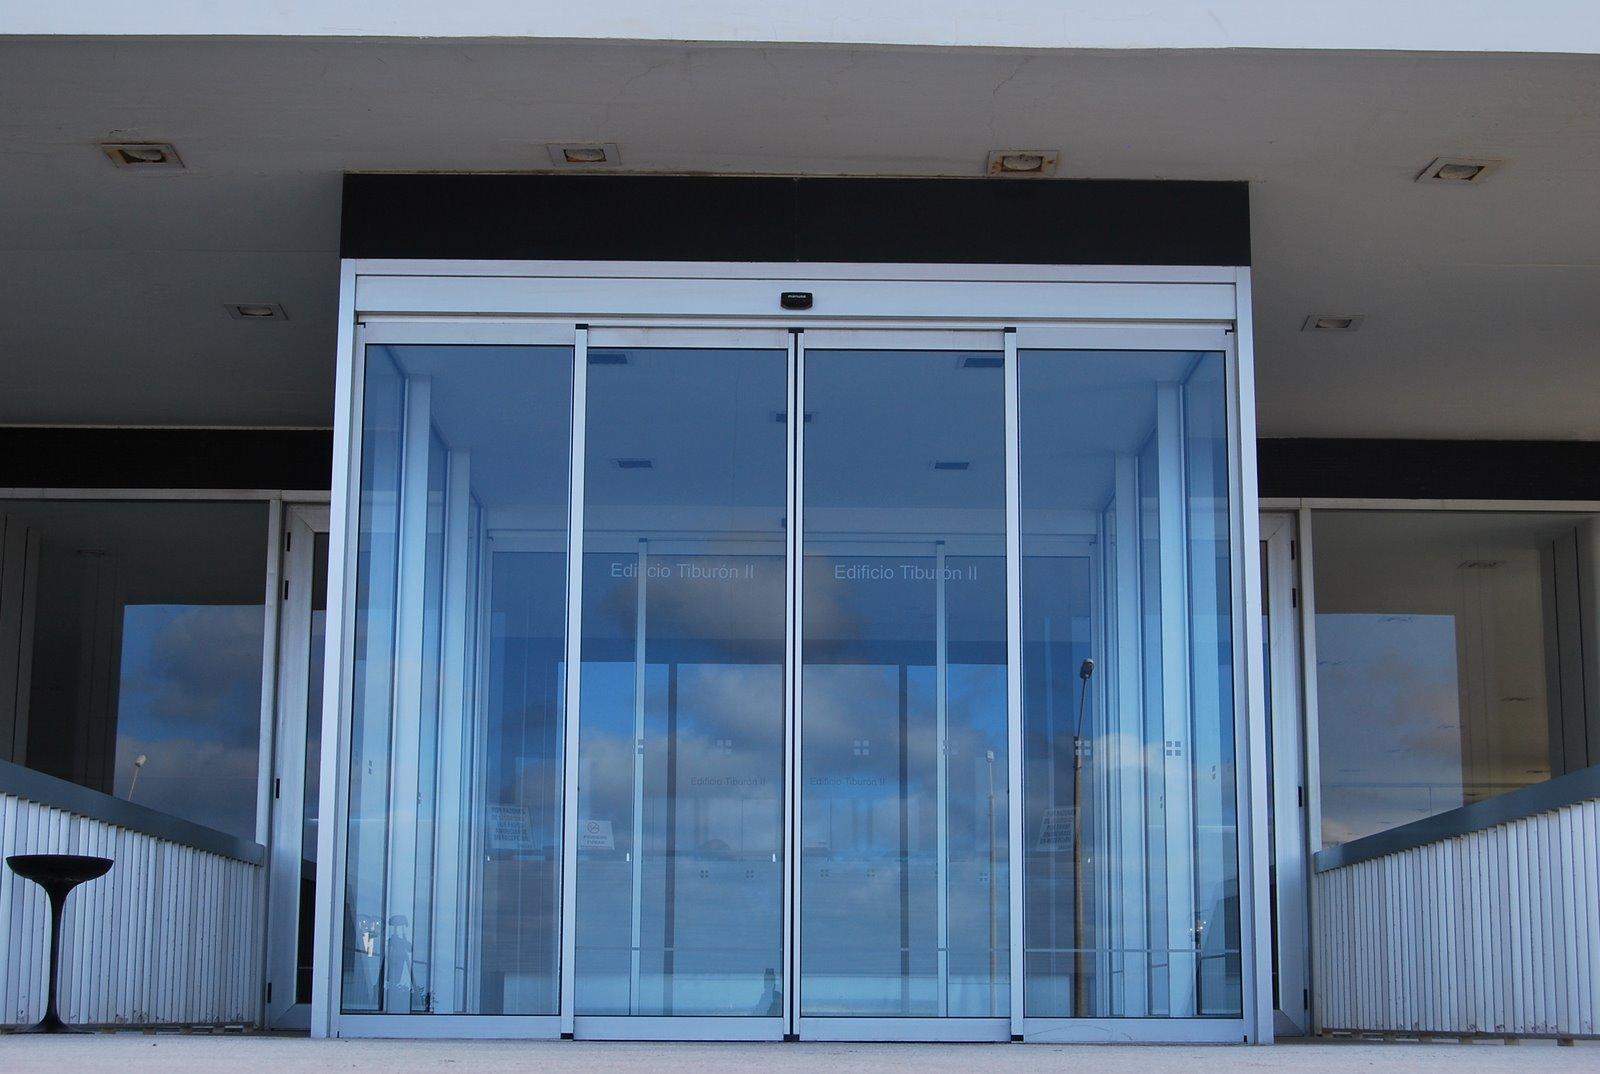 Manusa puertas autom ticas productos construnario for Puerta corredera automatica vidrio